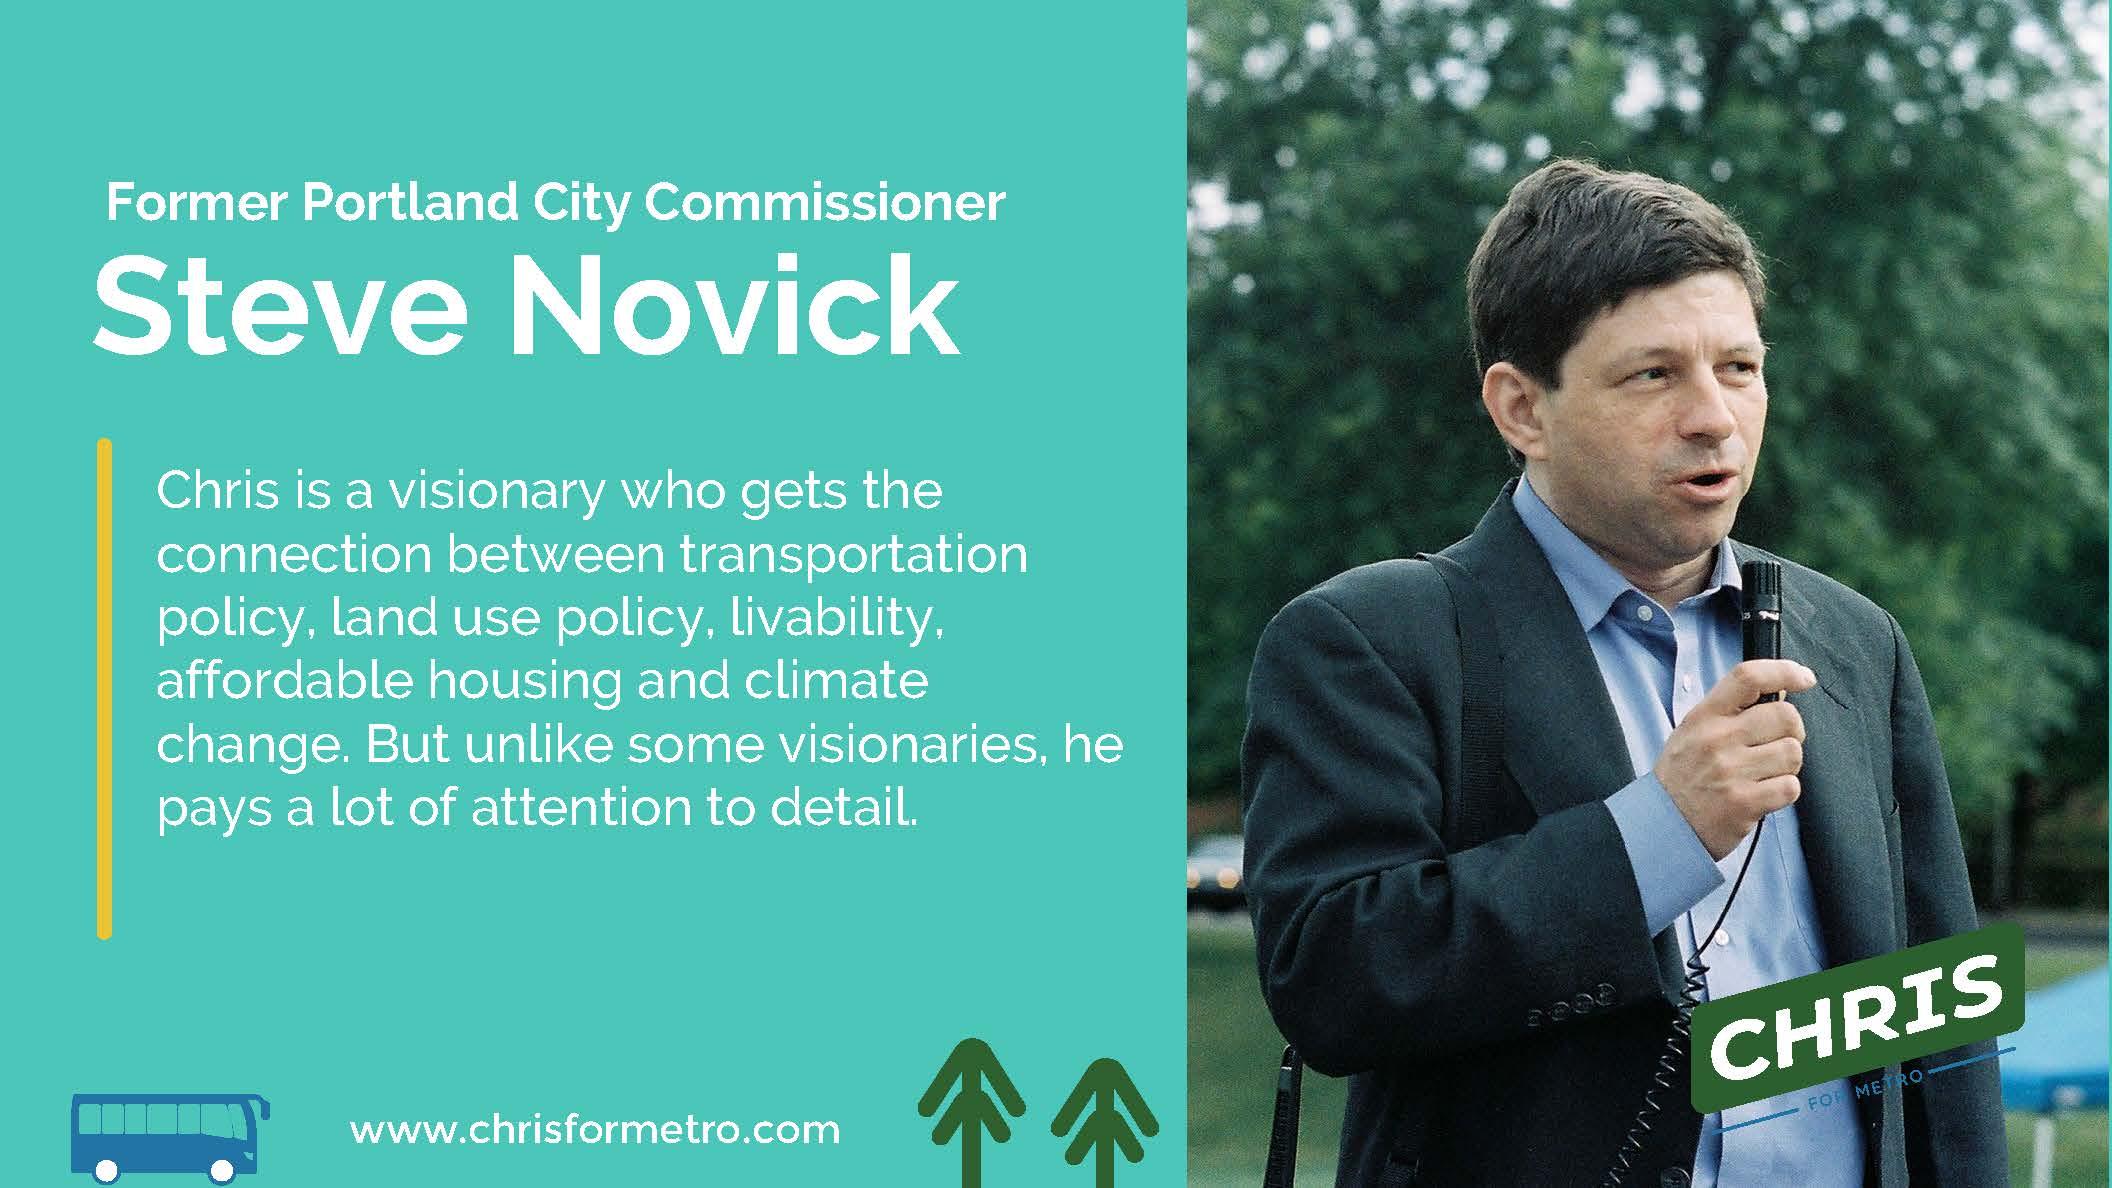 Steve Novick Endorsement